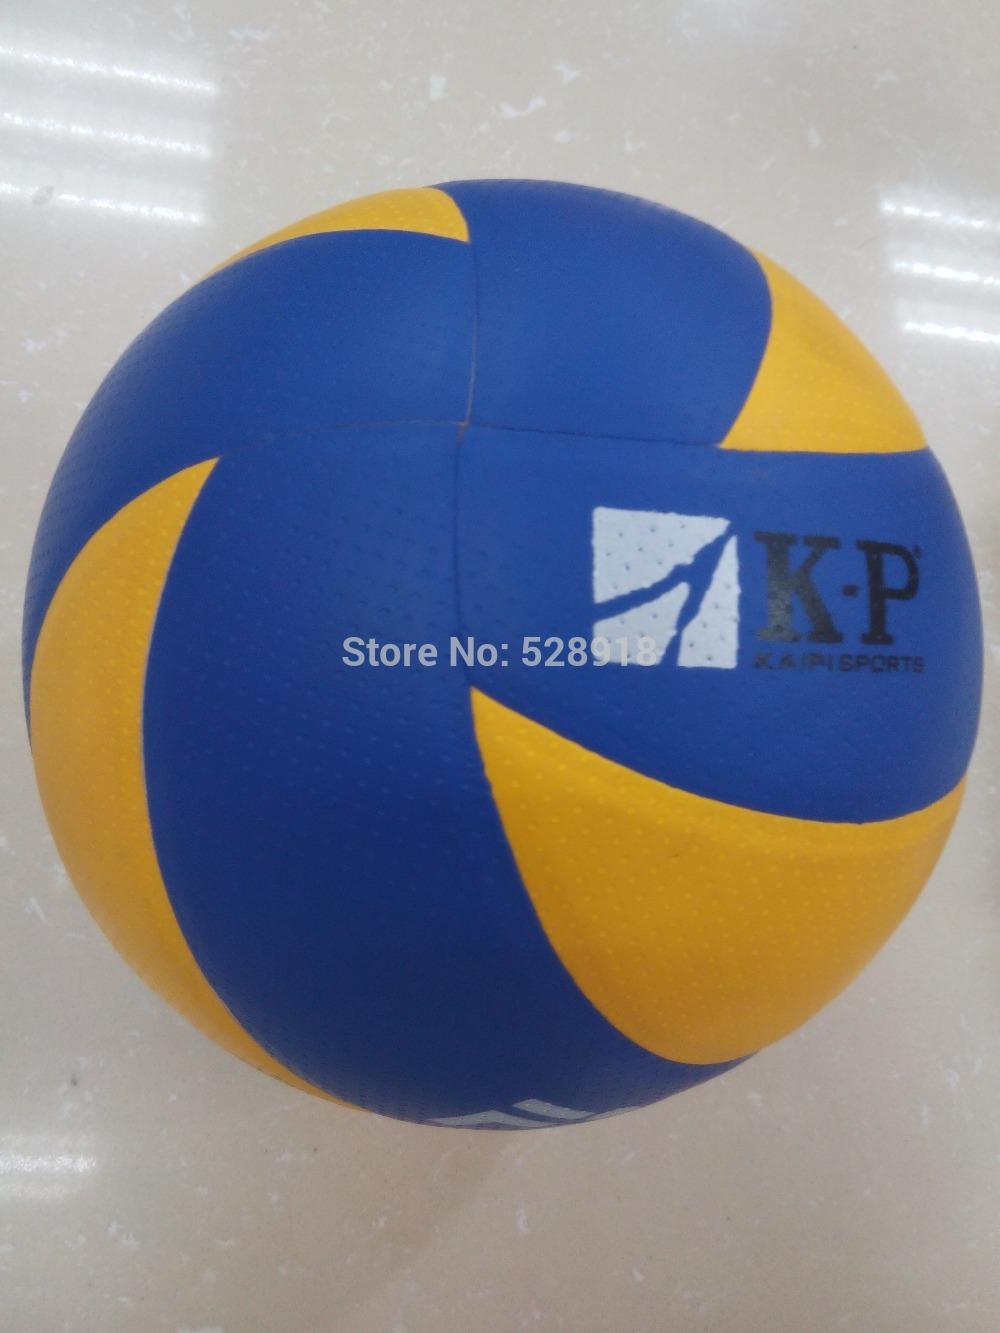 Товары для волейбола L-SPORT l/pq01 L-PQ01 l